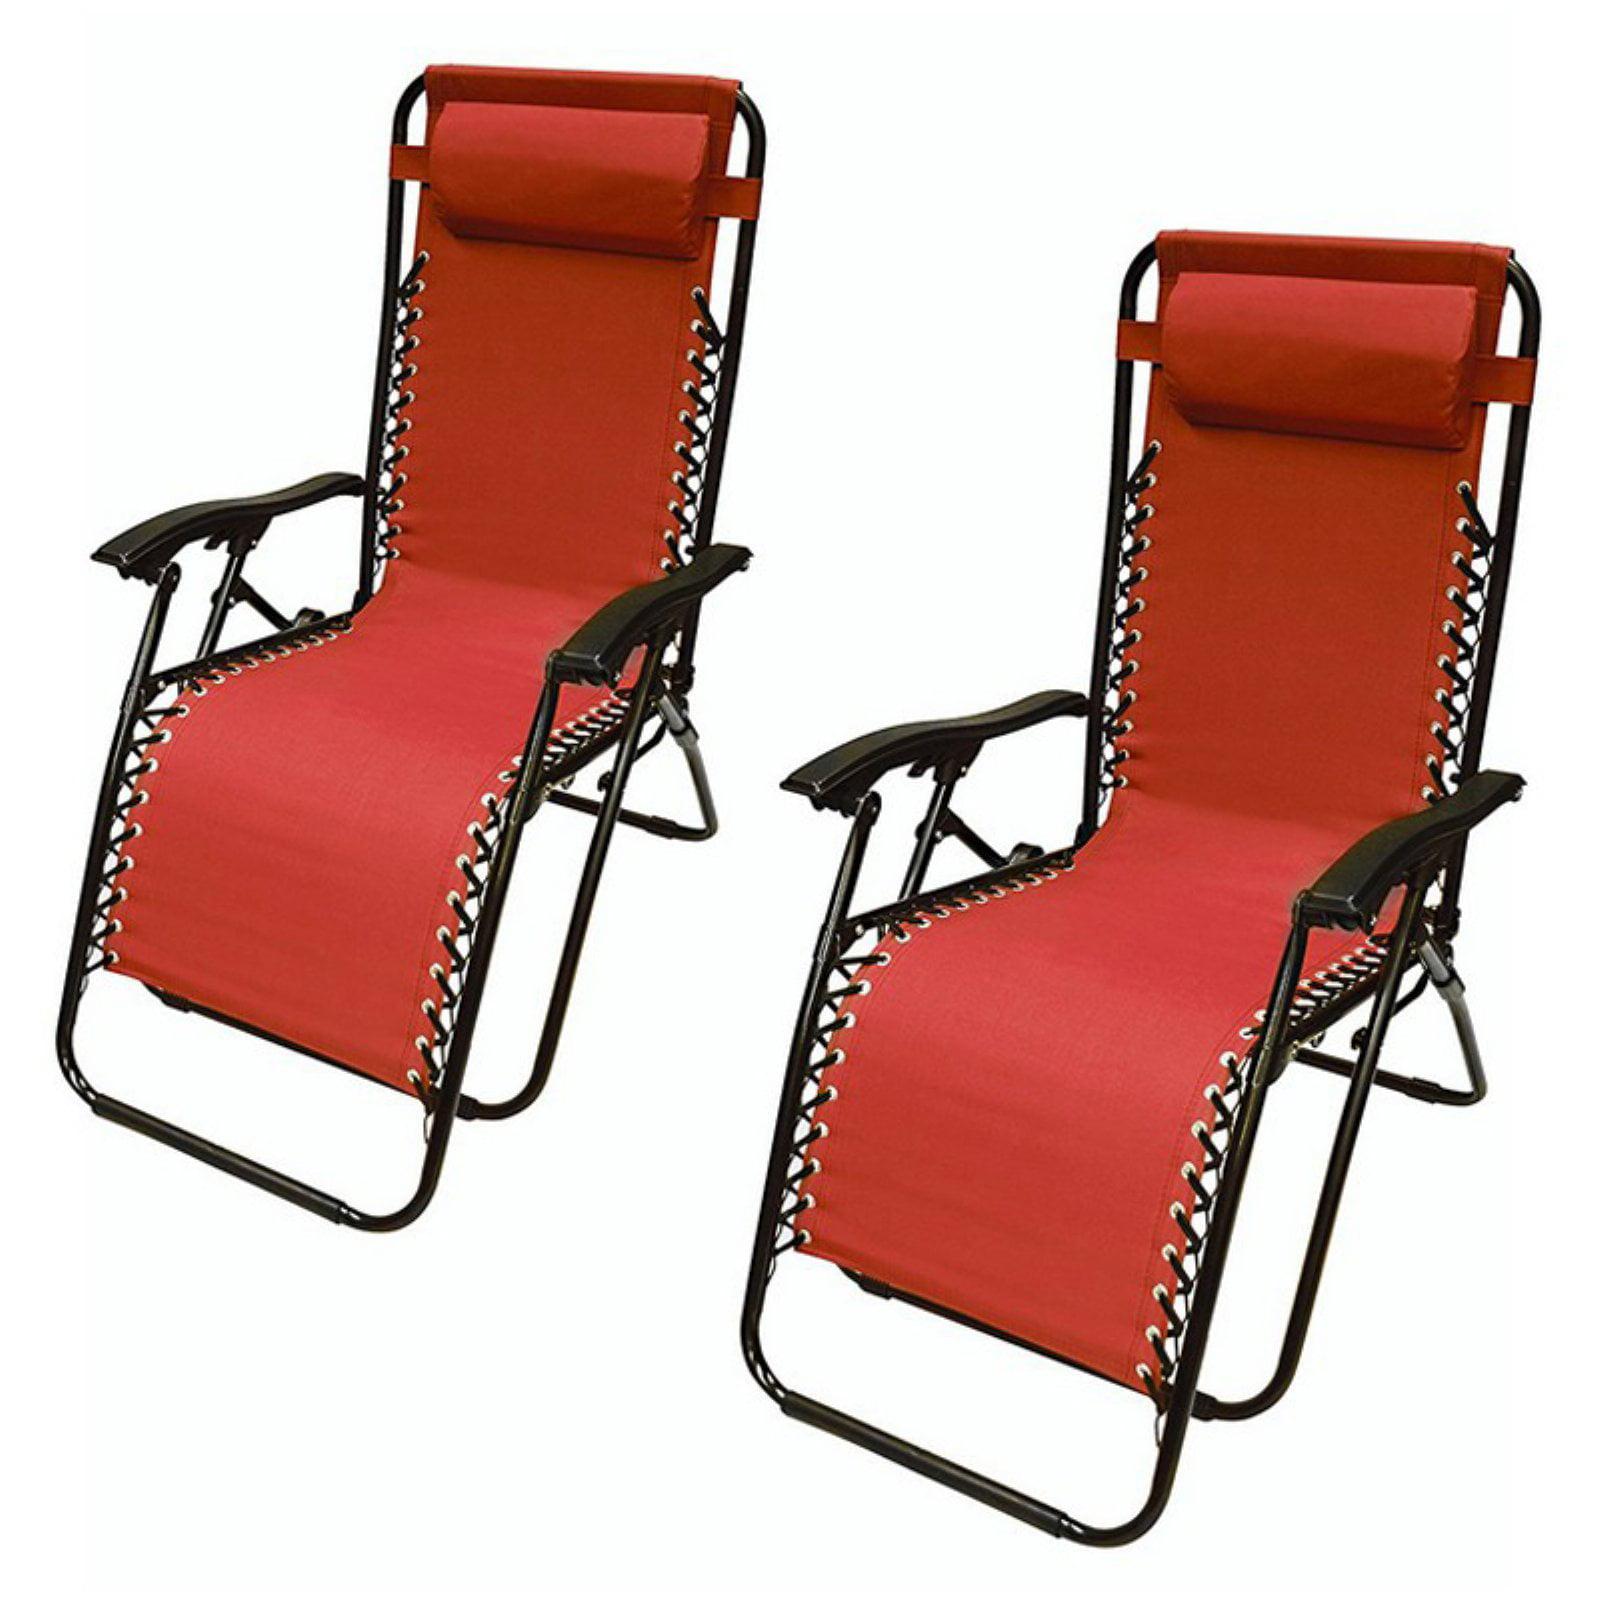 ALEKO Outdoor Patio Foldable Chaise-Longue Leisure Pool Beach Chair, Set of 2